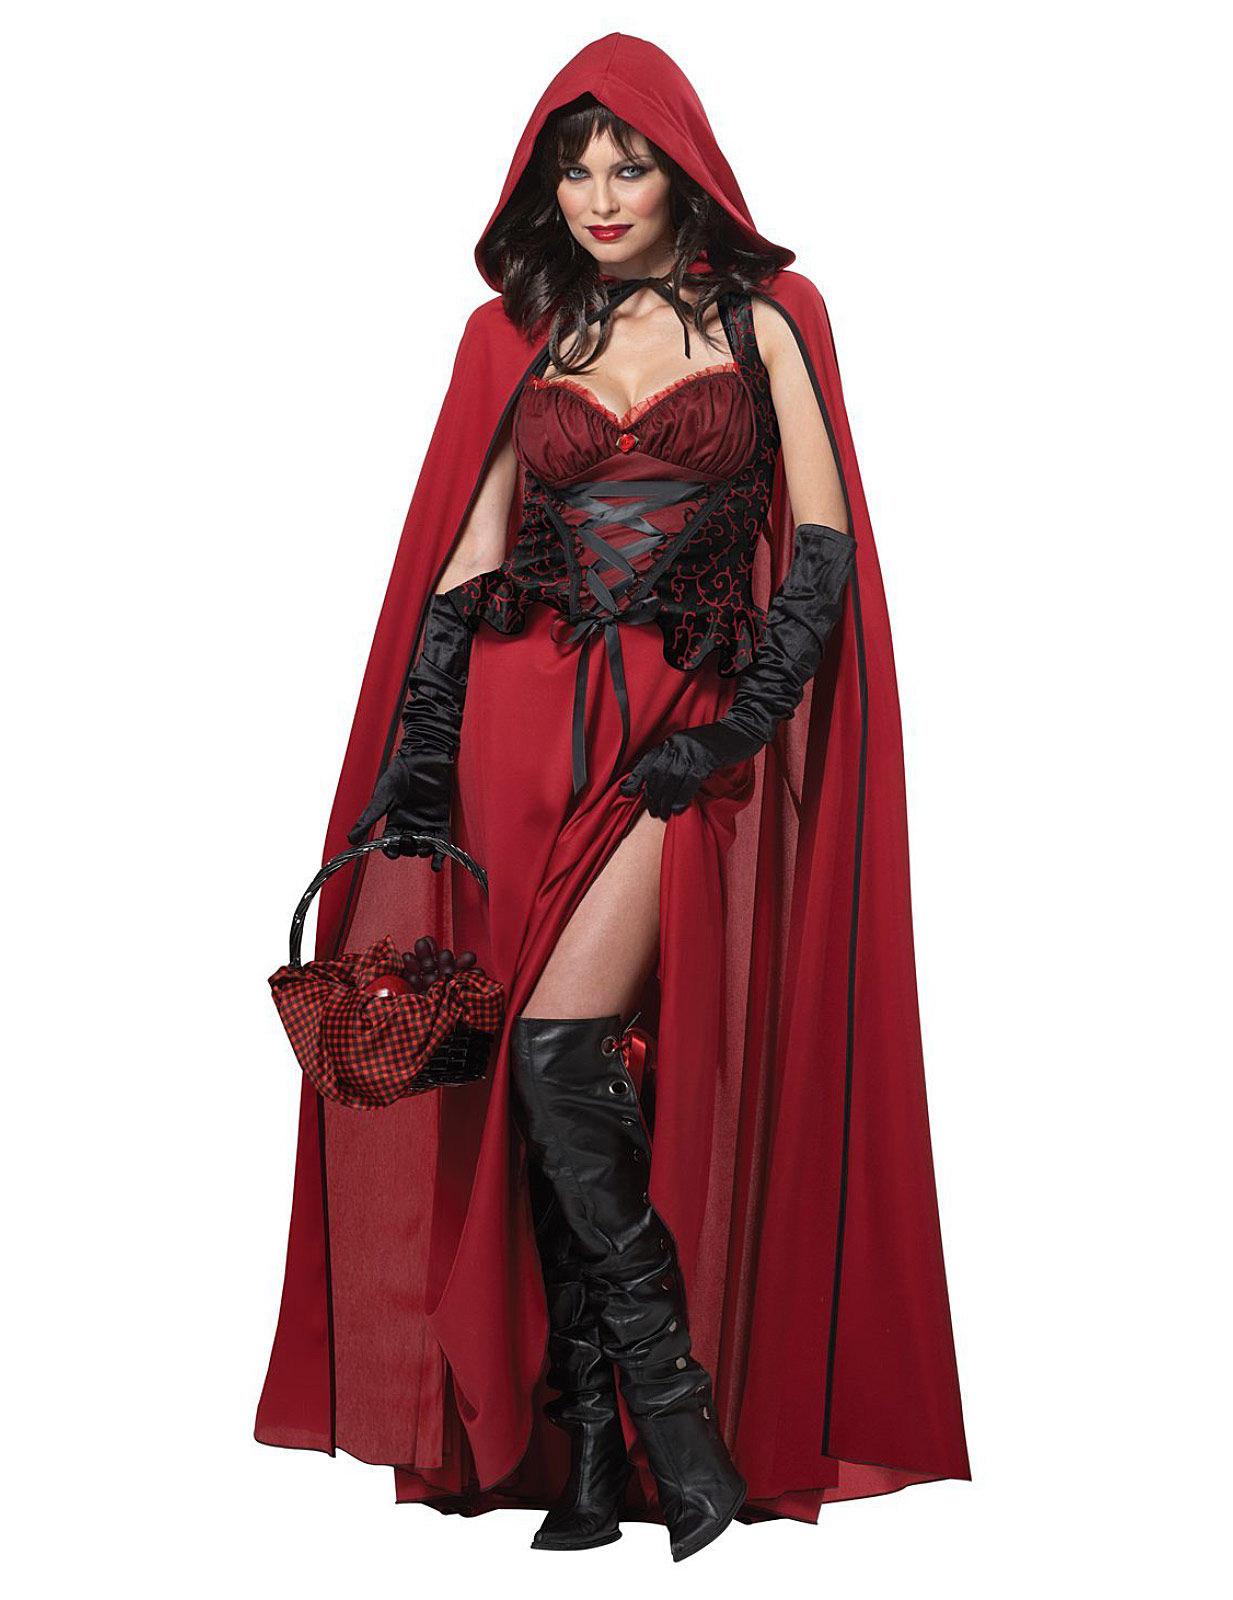 Caperucita Roja Halloween.Disfraz Caperucita Roja Malefica Halloween